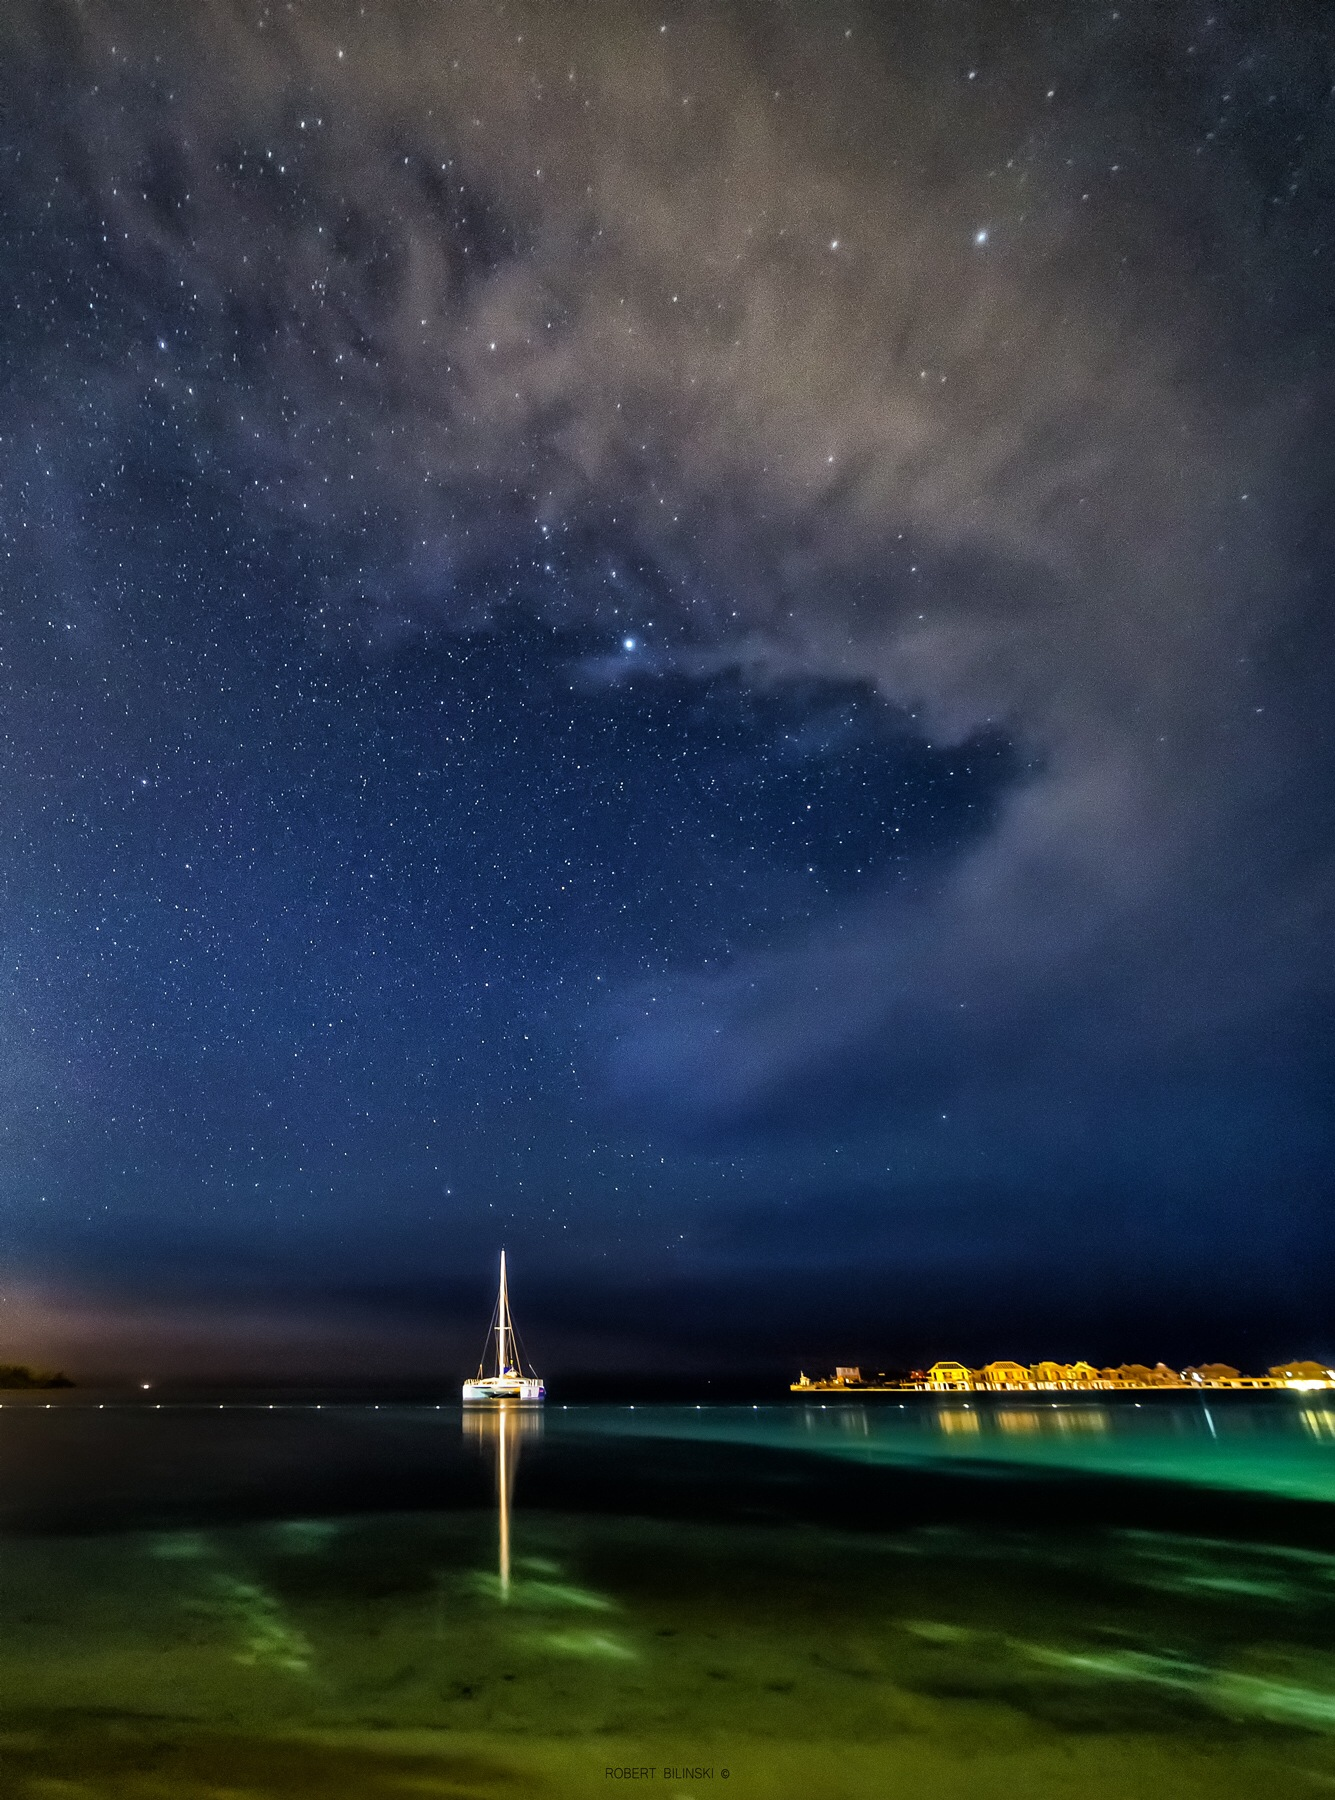 Night sky in Jamaica  by Robert Bilinski